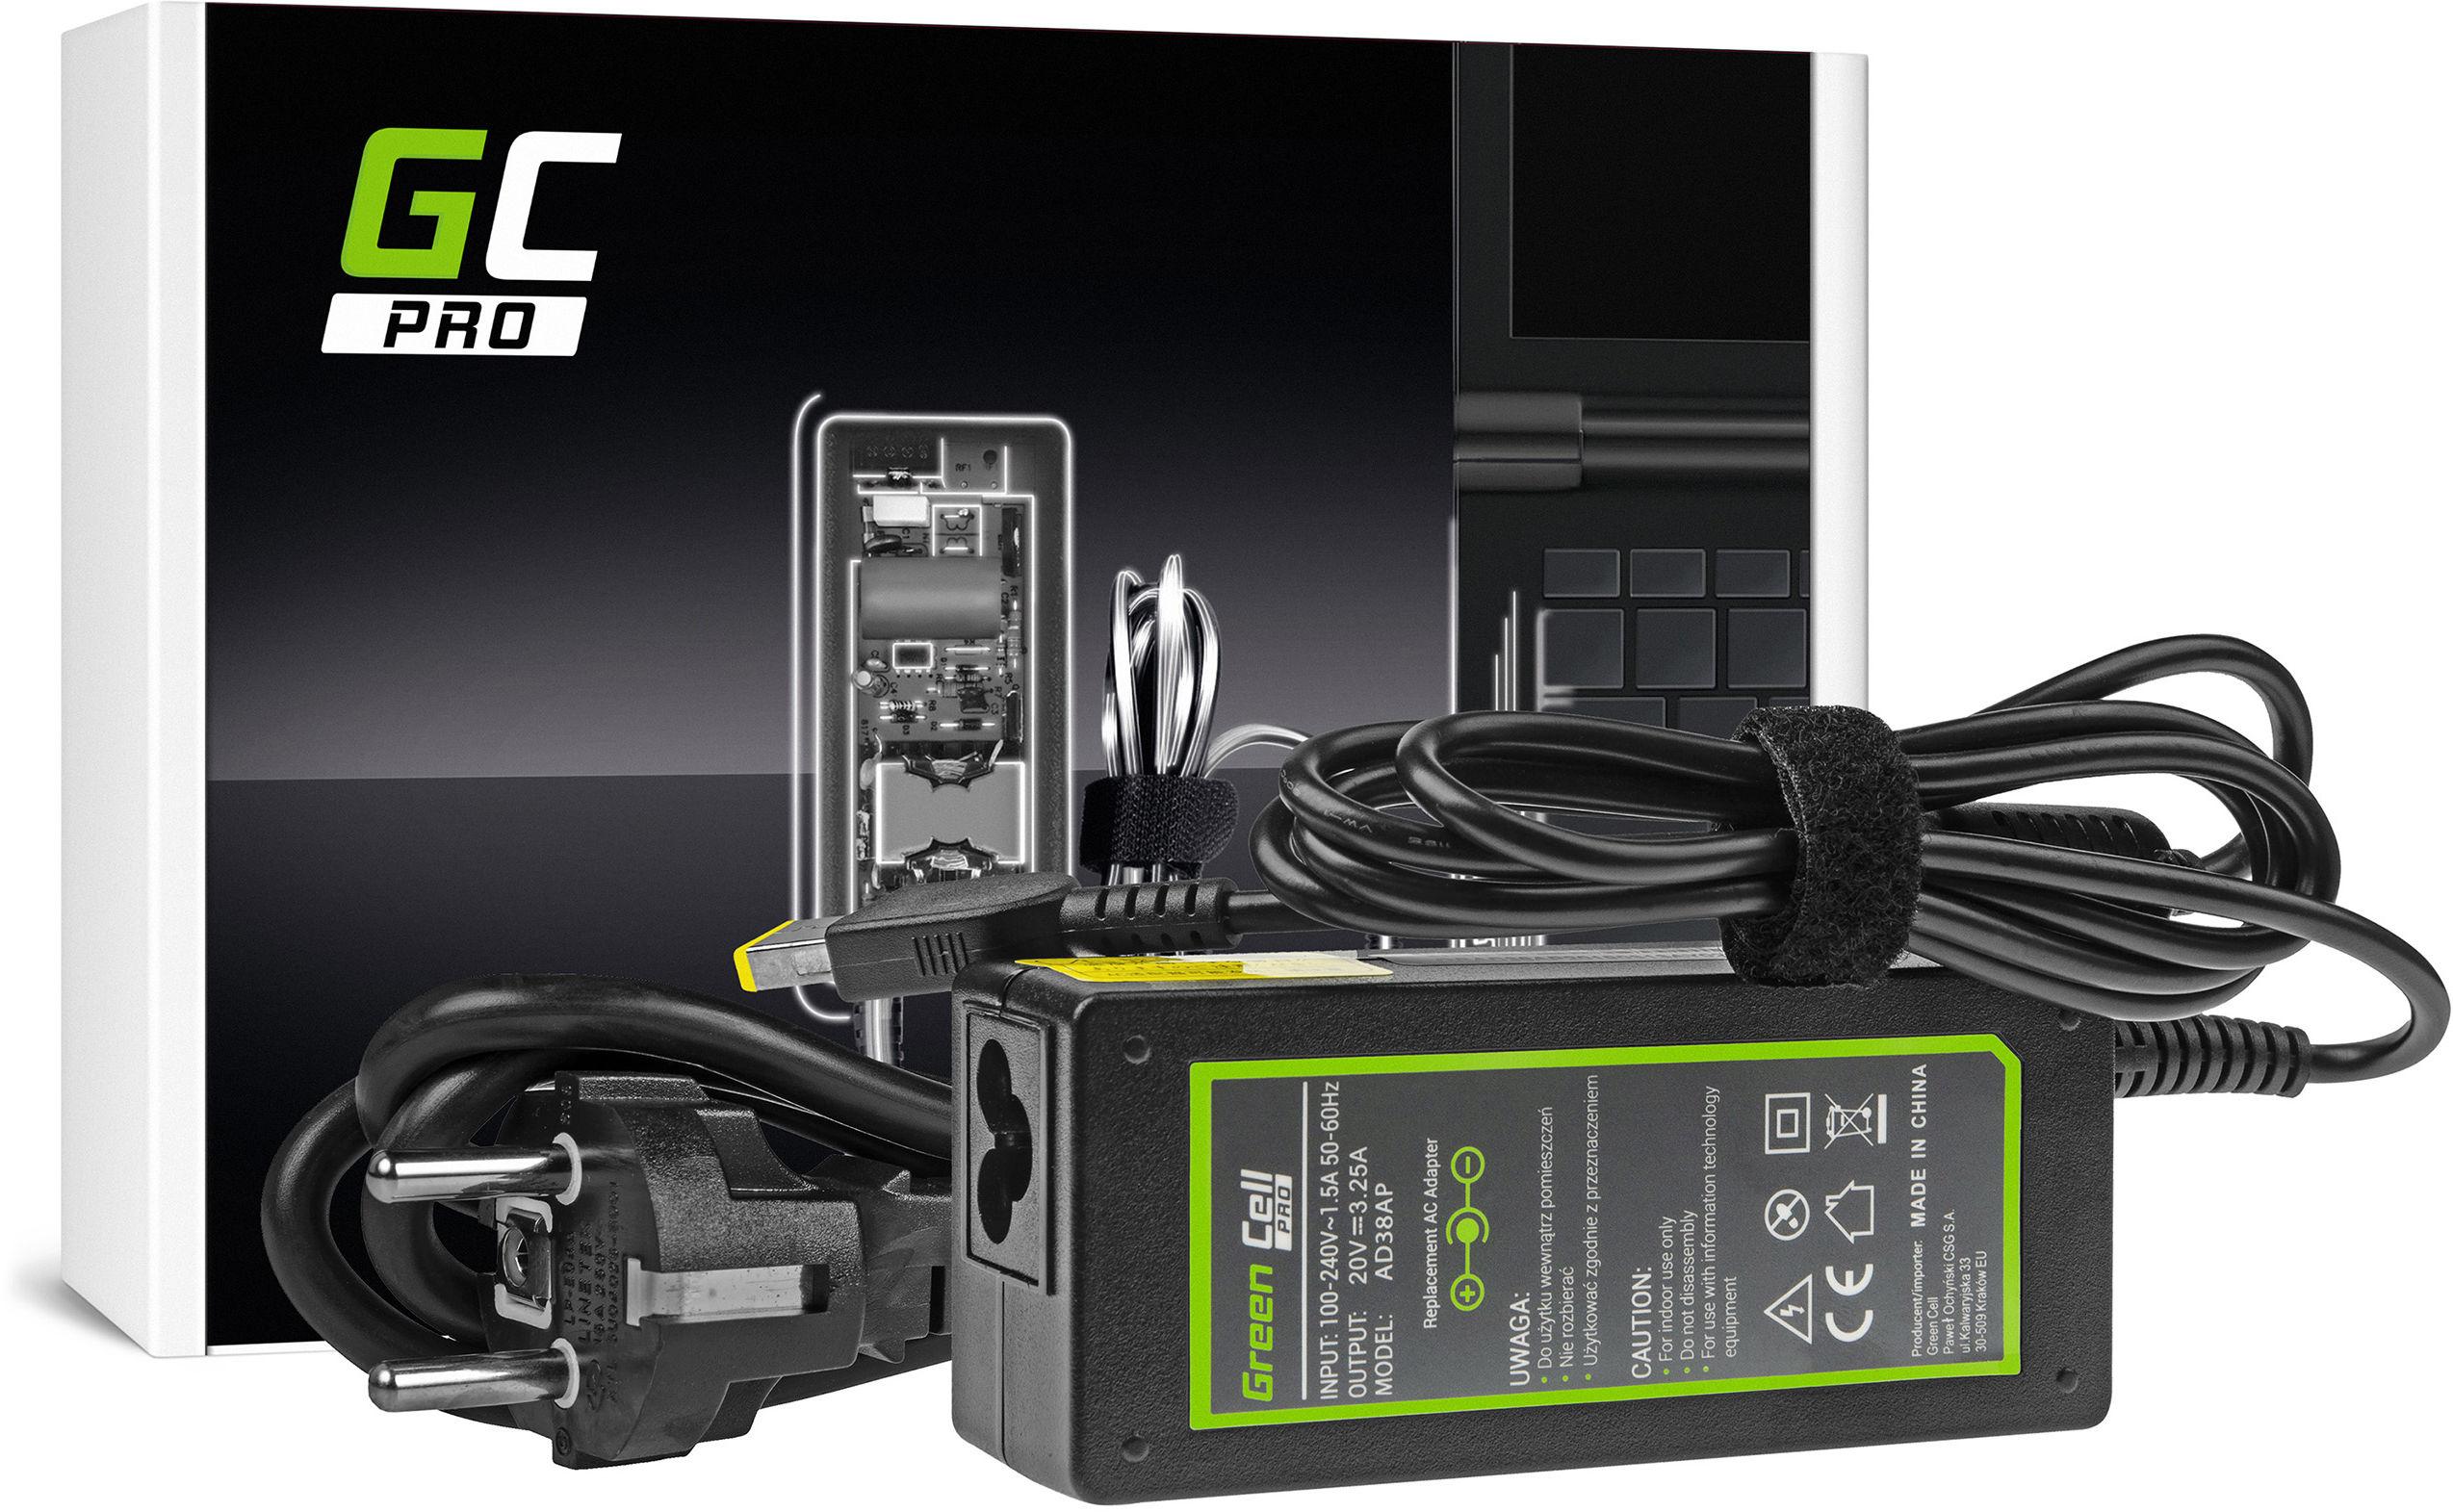 Zasilacz Ładowarka Green Cell PRO 20V 3.25A 65W do Lenovo B50 G50 G50-30 G50-45 G50-70 G50-80 G500 G500s G505 G700 G710 Z50-70